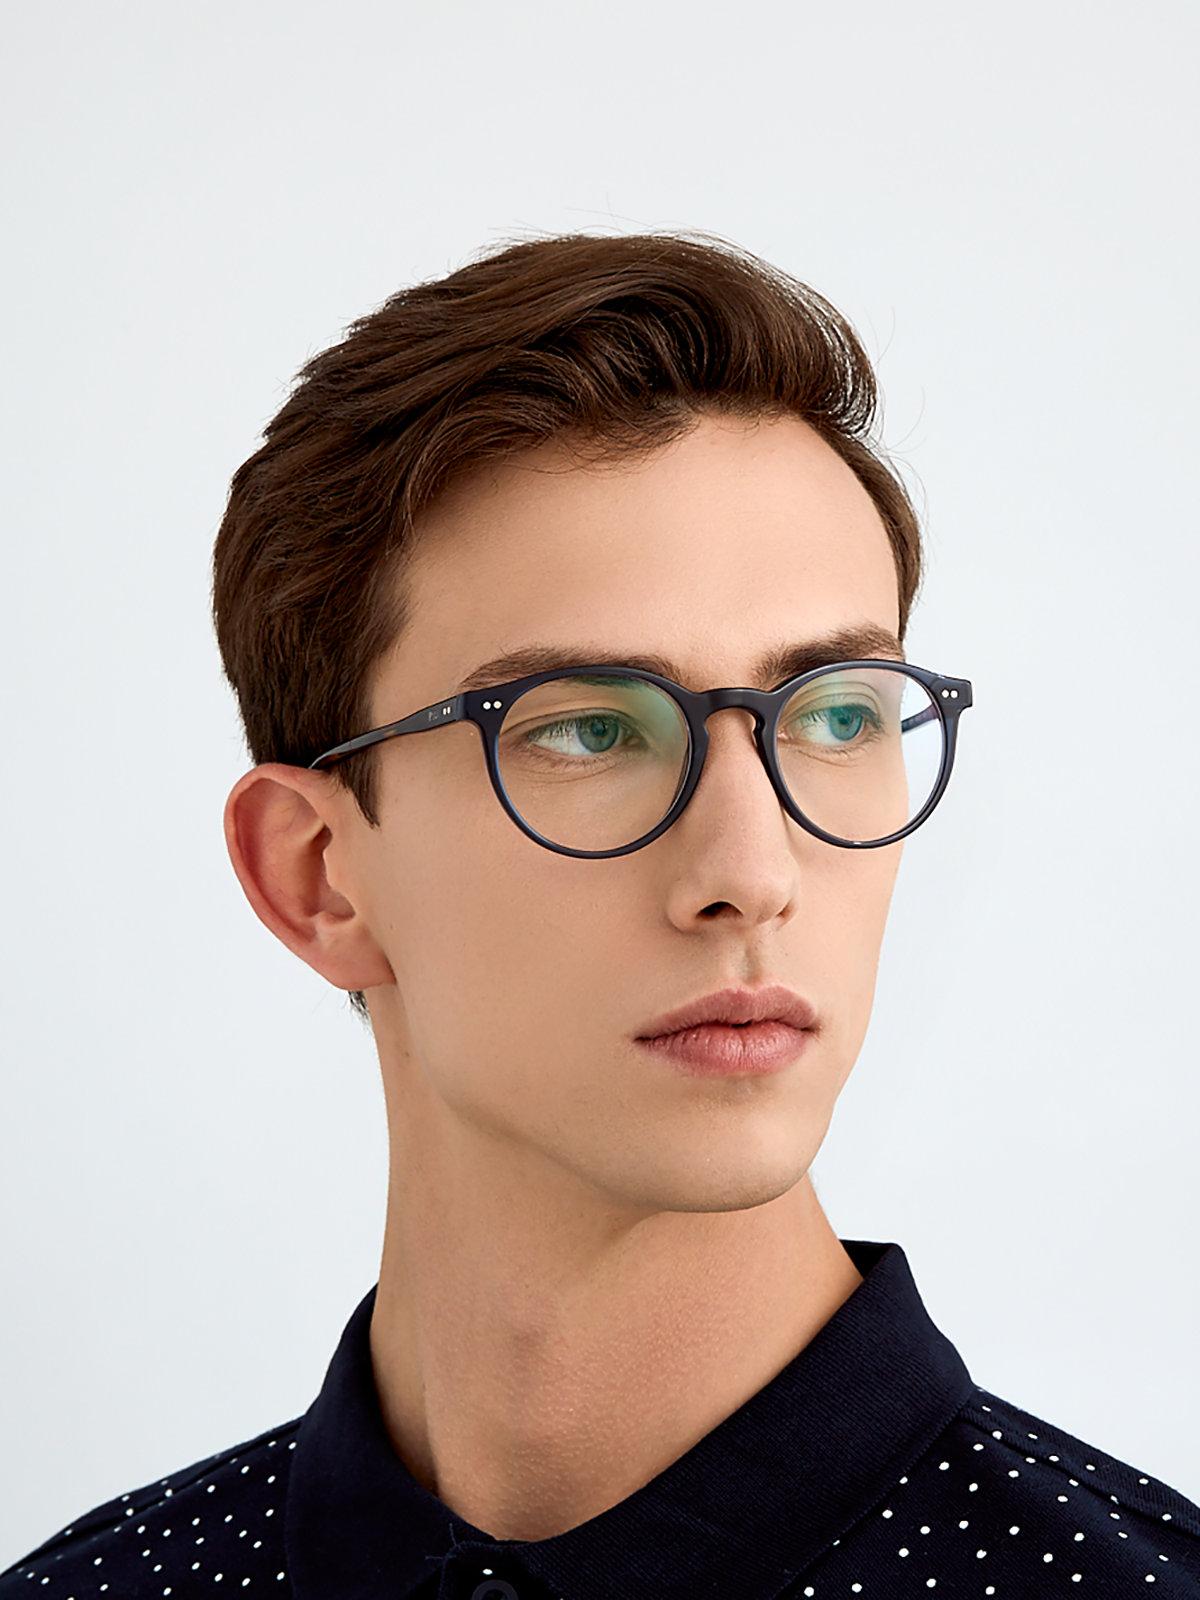 e0e4582acdba Polo Ralph Lauren PH2083 | Glasses.com® | Free Shipping